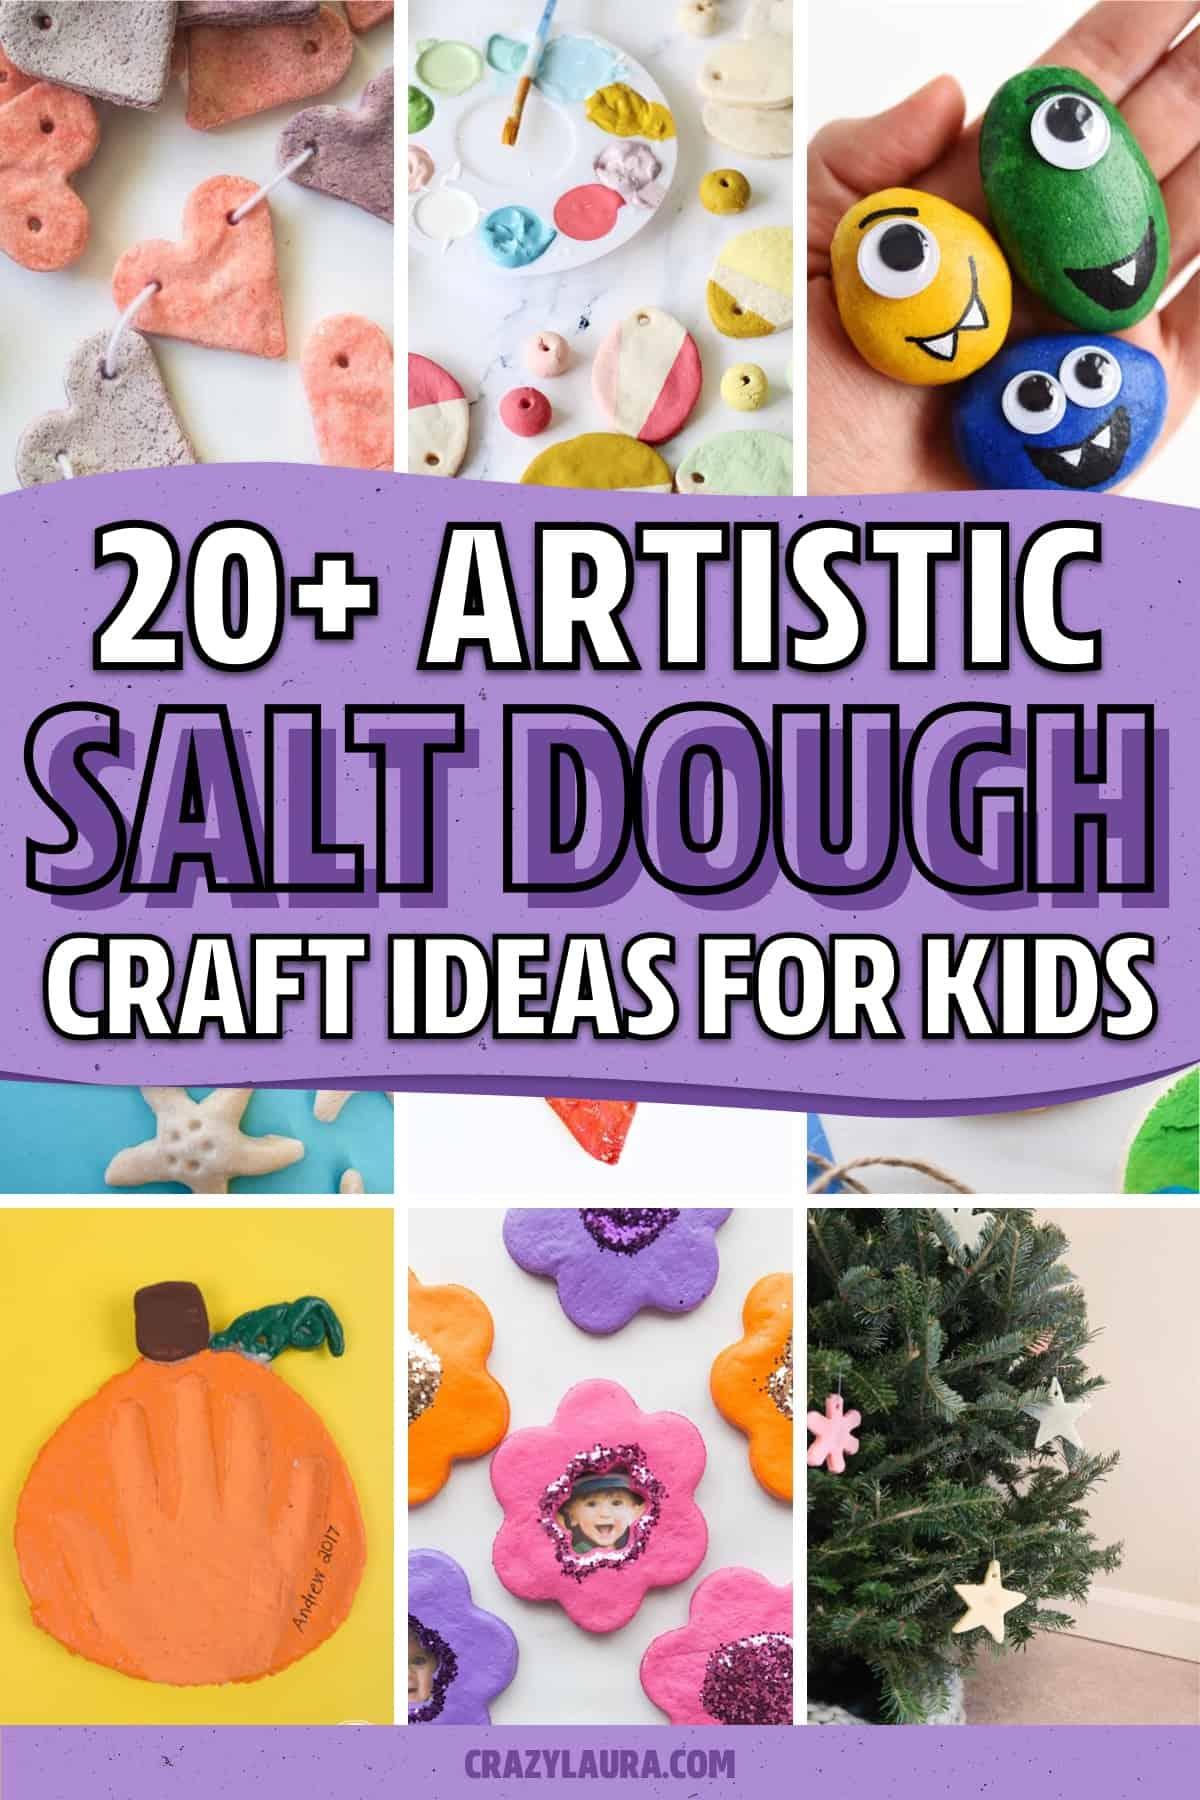 salt dough crafts to try